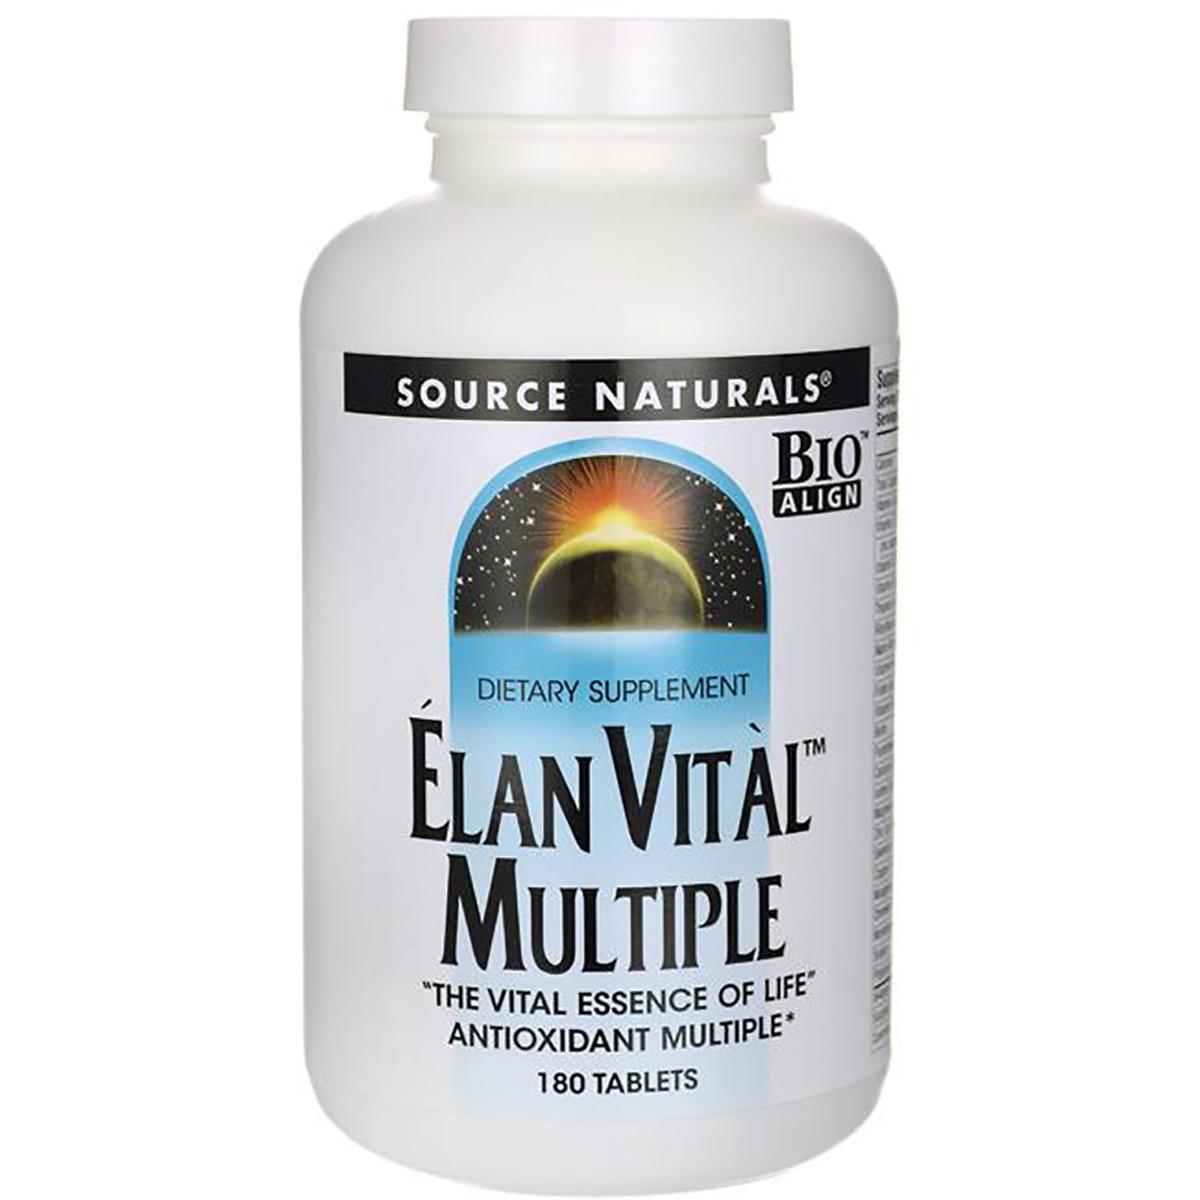 Мультивитамины, Elan Vital Multiple, Source Naturals, 180 таблеток